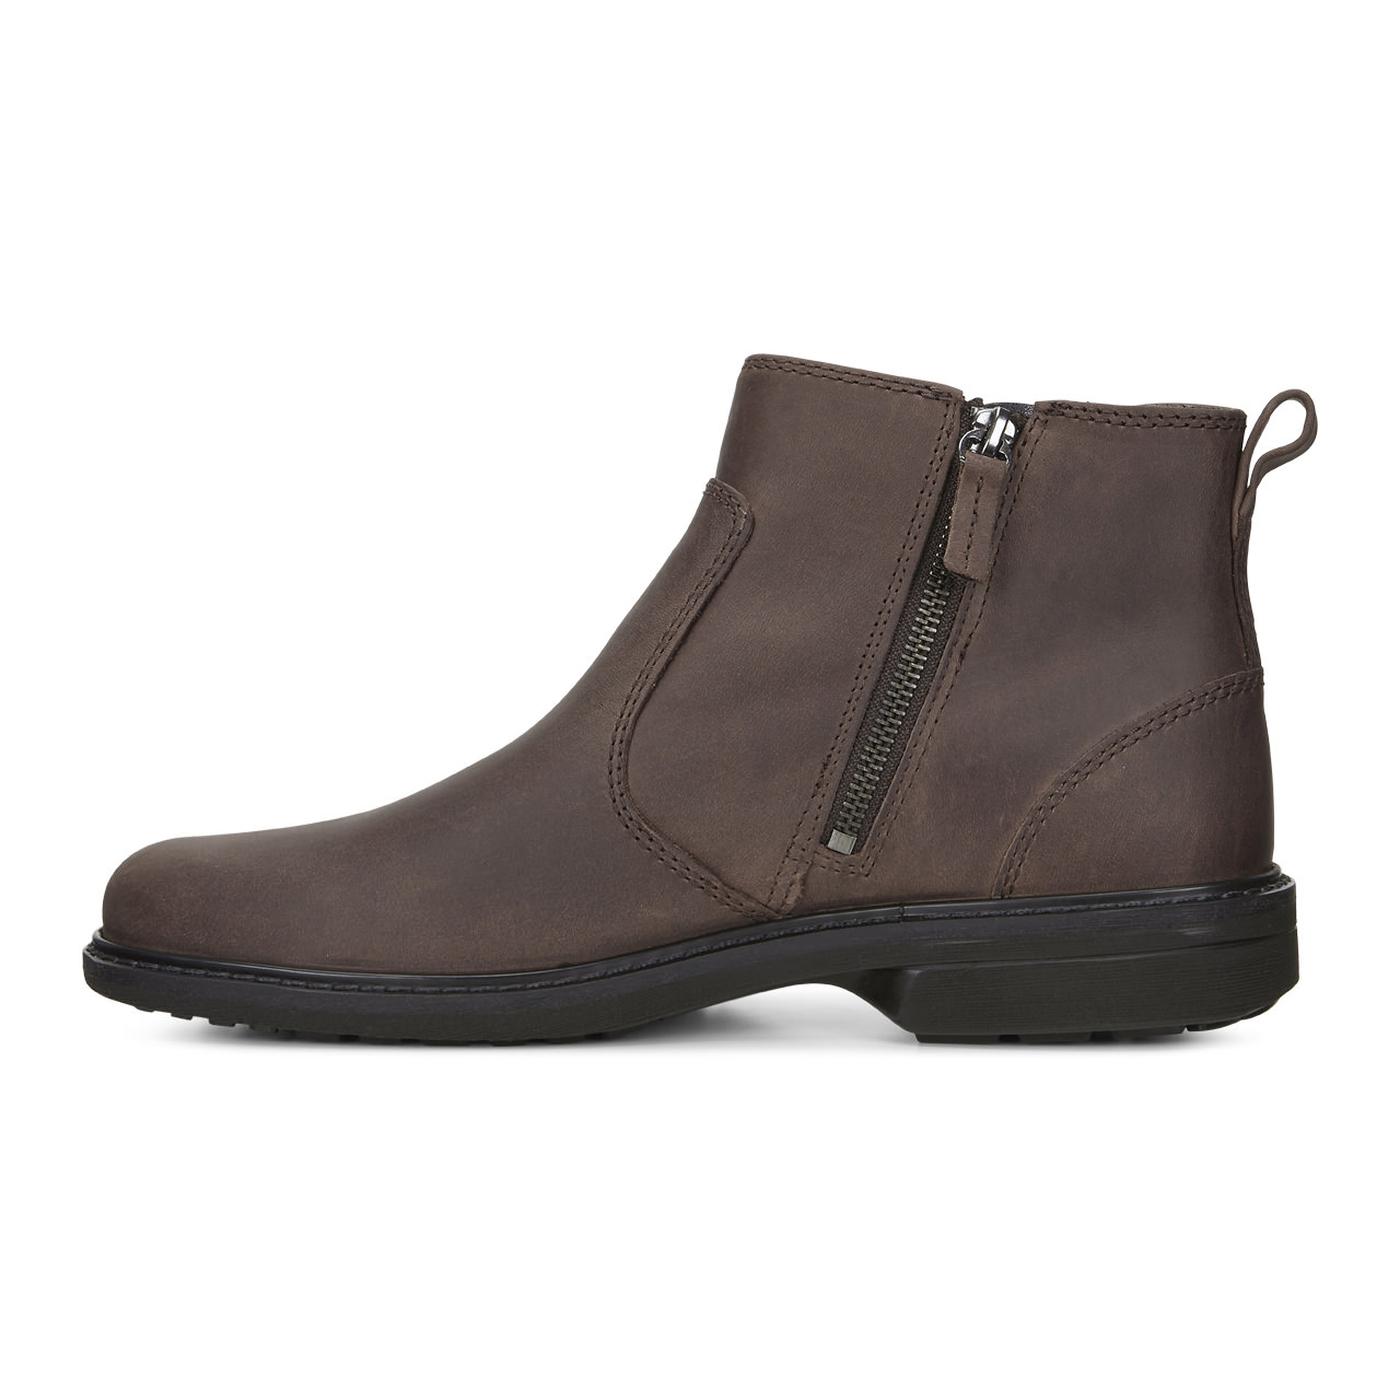 ECCO TURN GTX Men's Chukka Boot